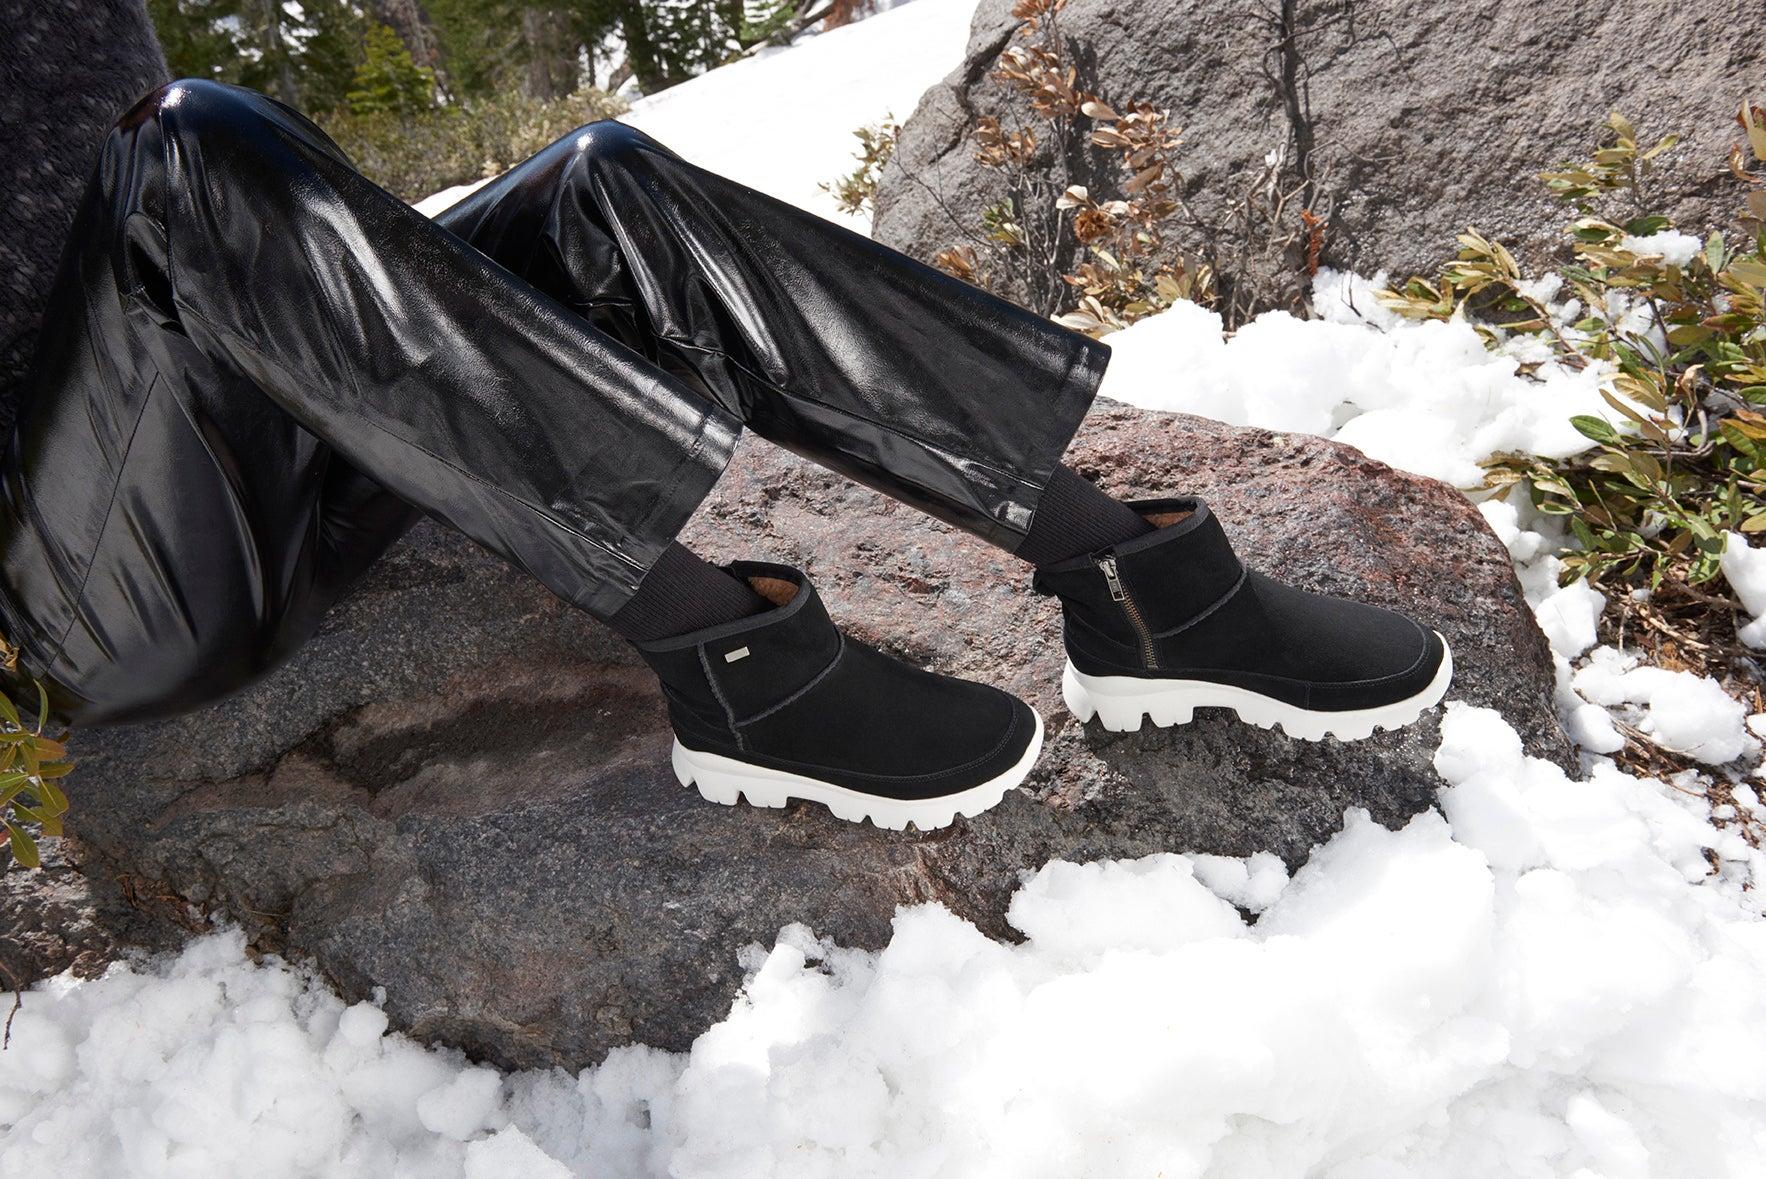 Lds Palomar blk/char wtpf winter boot